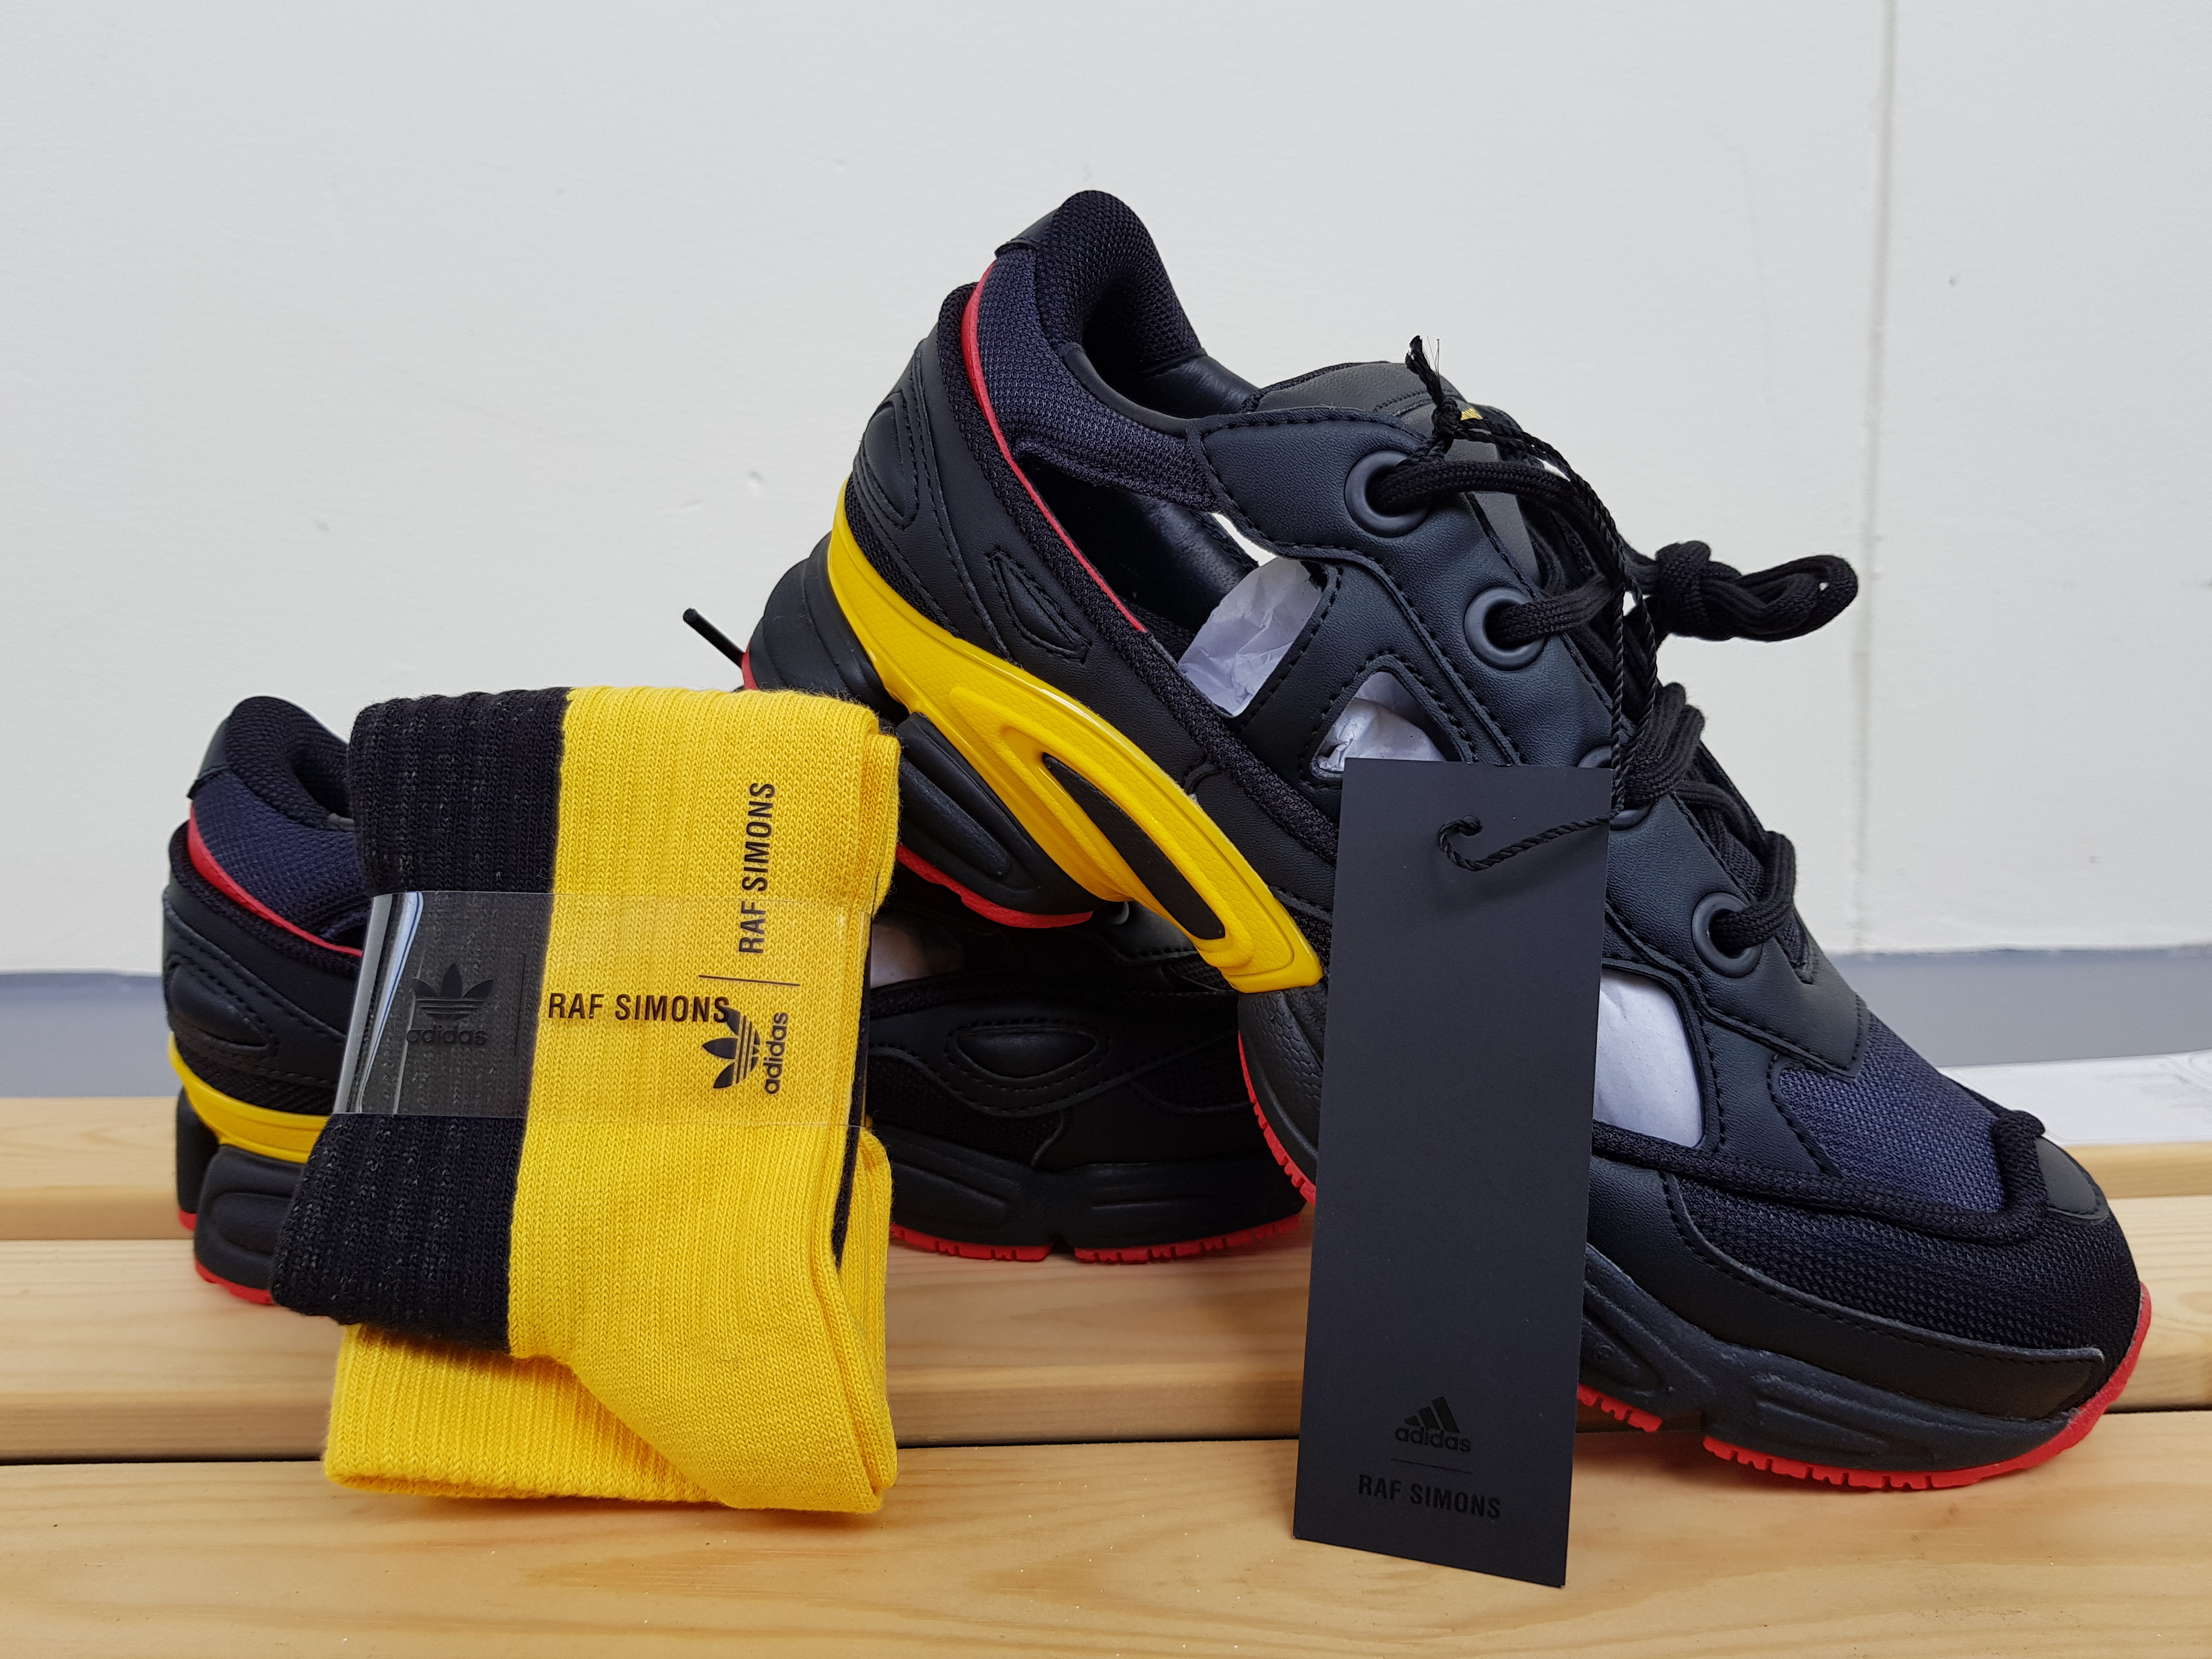 Adidas x Raf Simons Replicant Ozweego 'Belgium' Pack Trainer